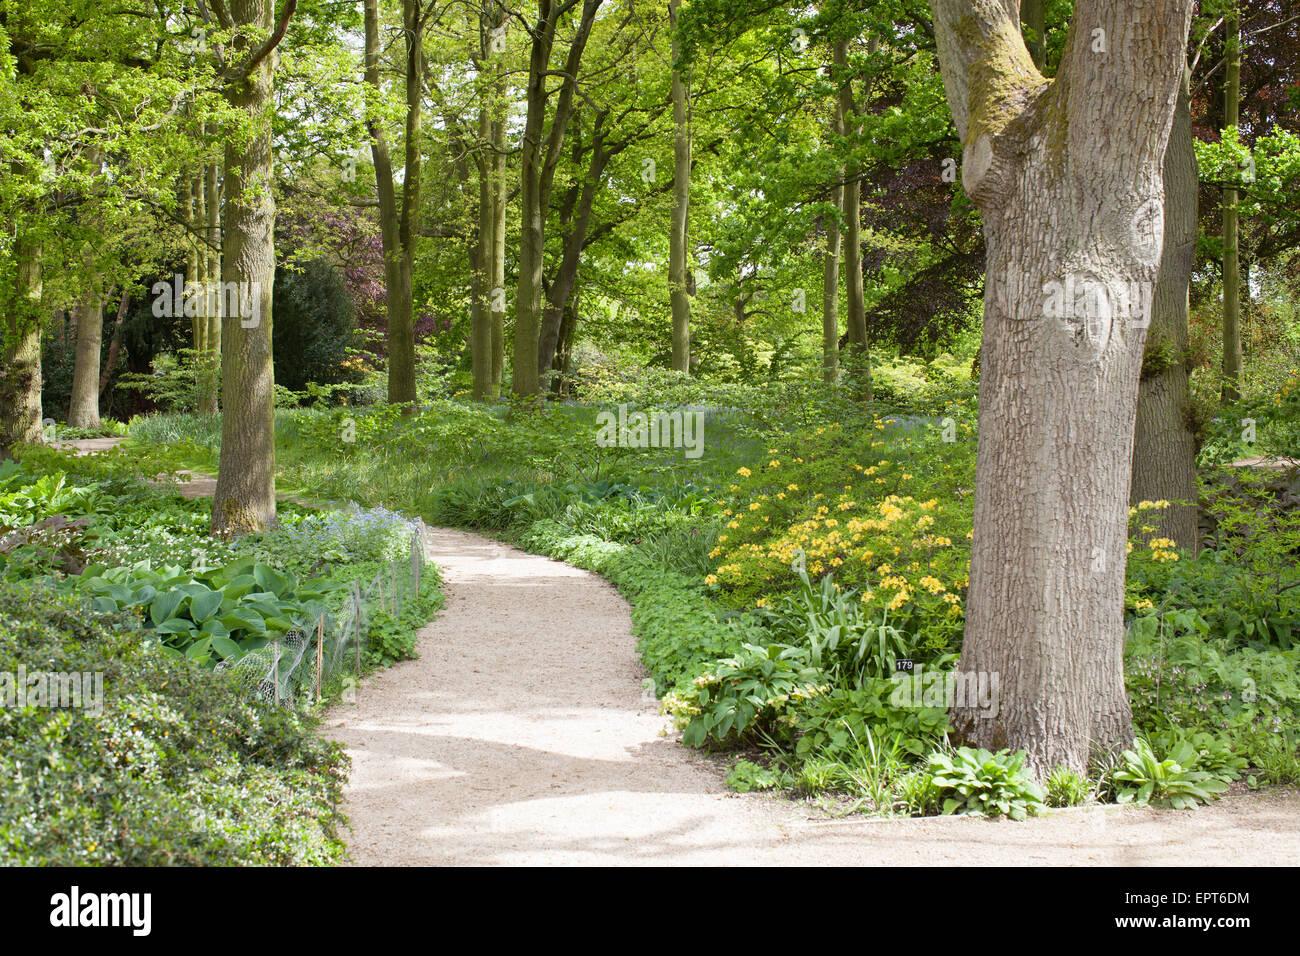 The garden at Dunham Massey National Trust property, Altrincham, UK. - Stock Image